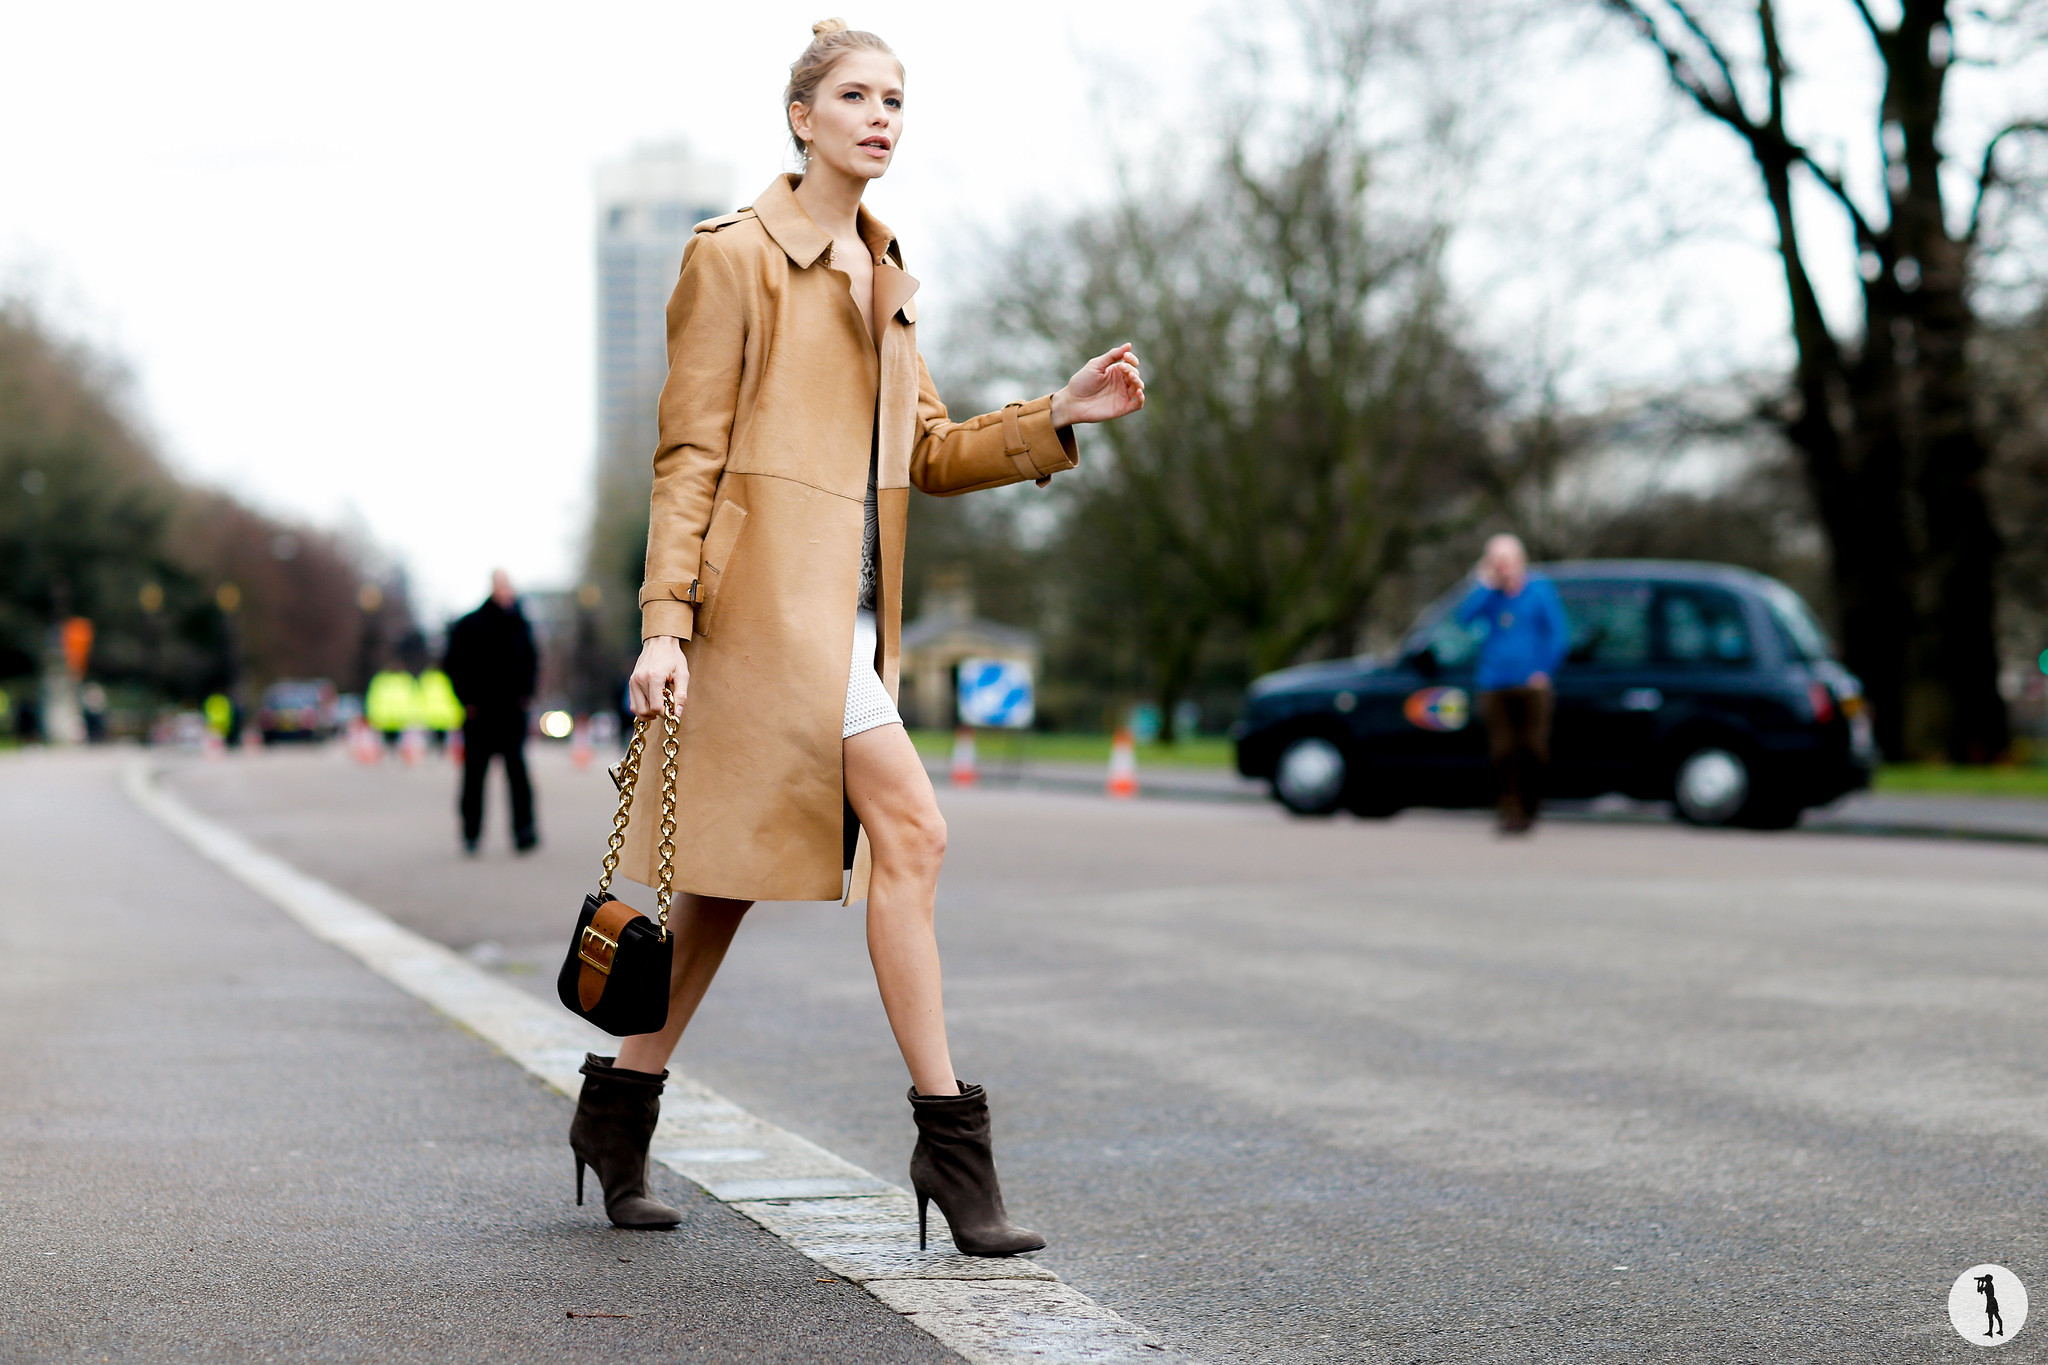 Elena Perminova - London Fashion Week RDT FW16-17 (3)